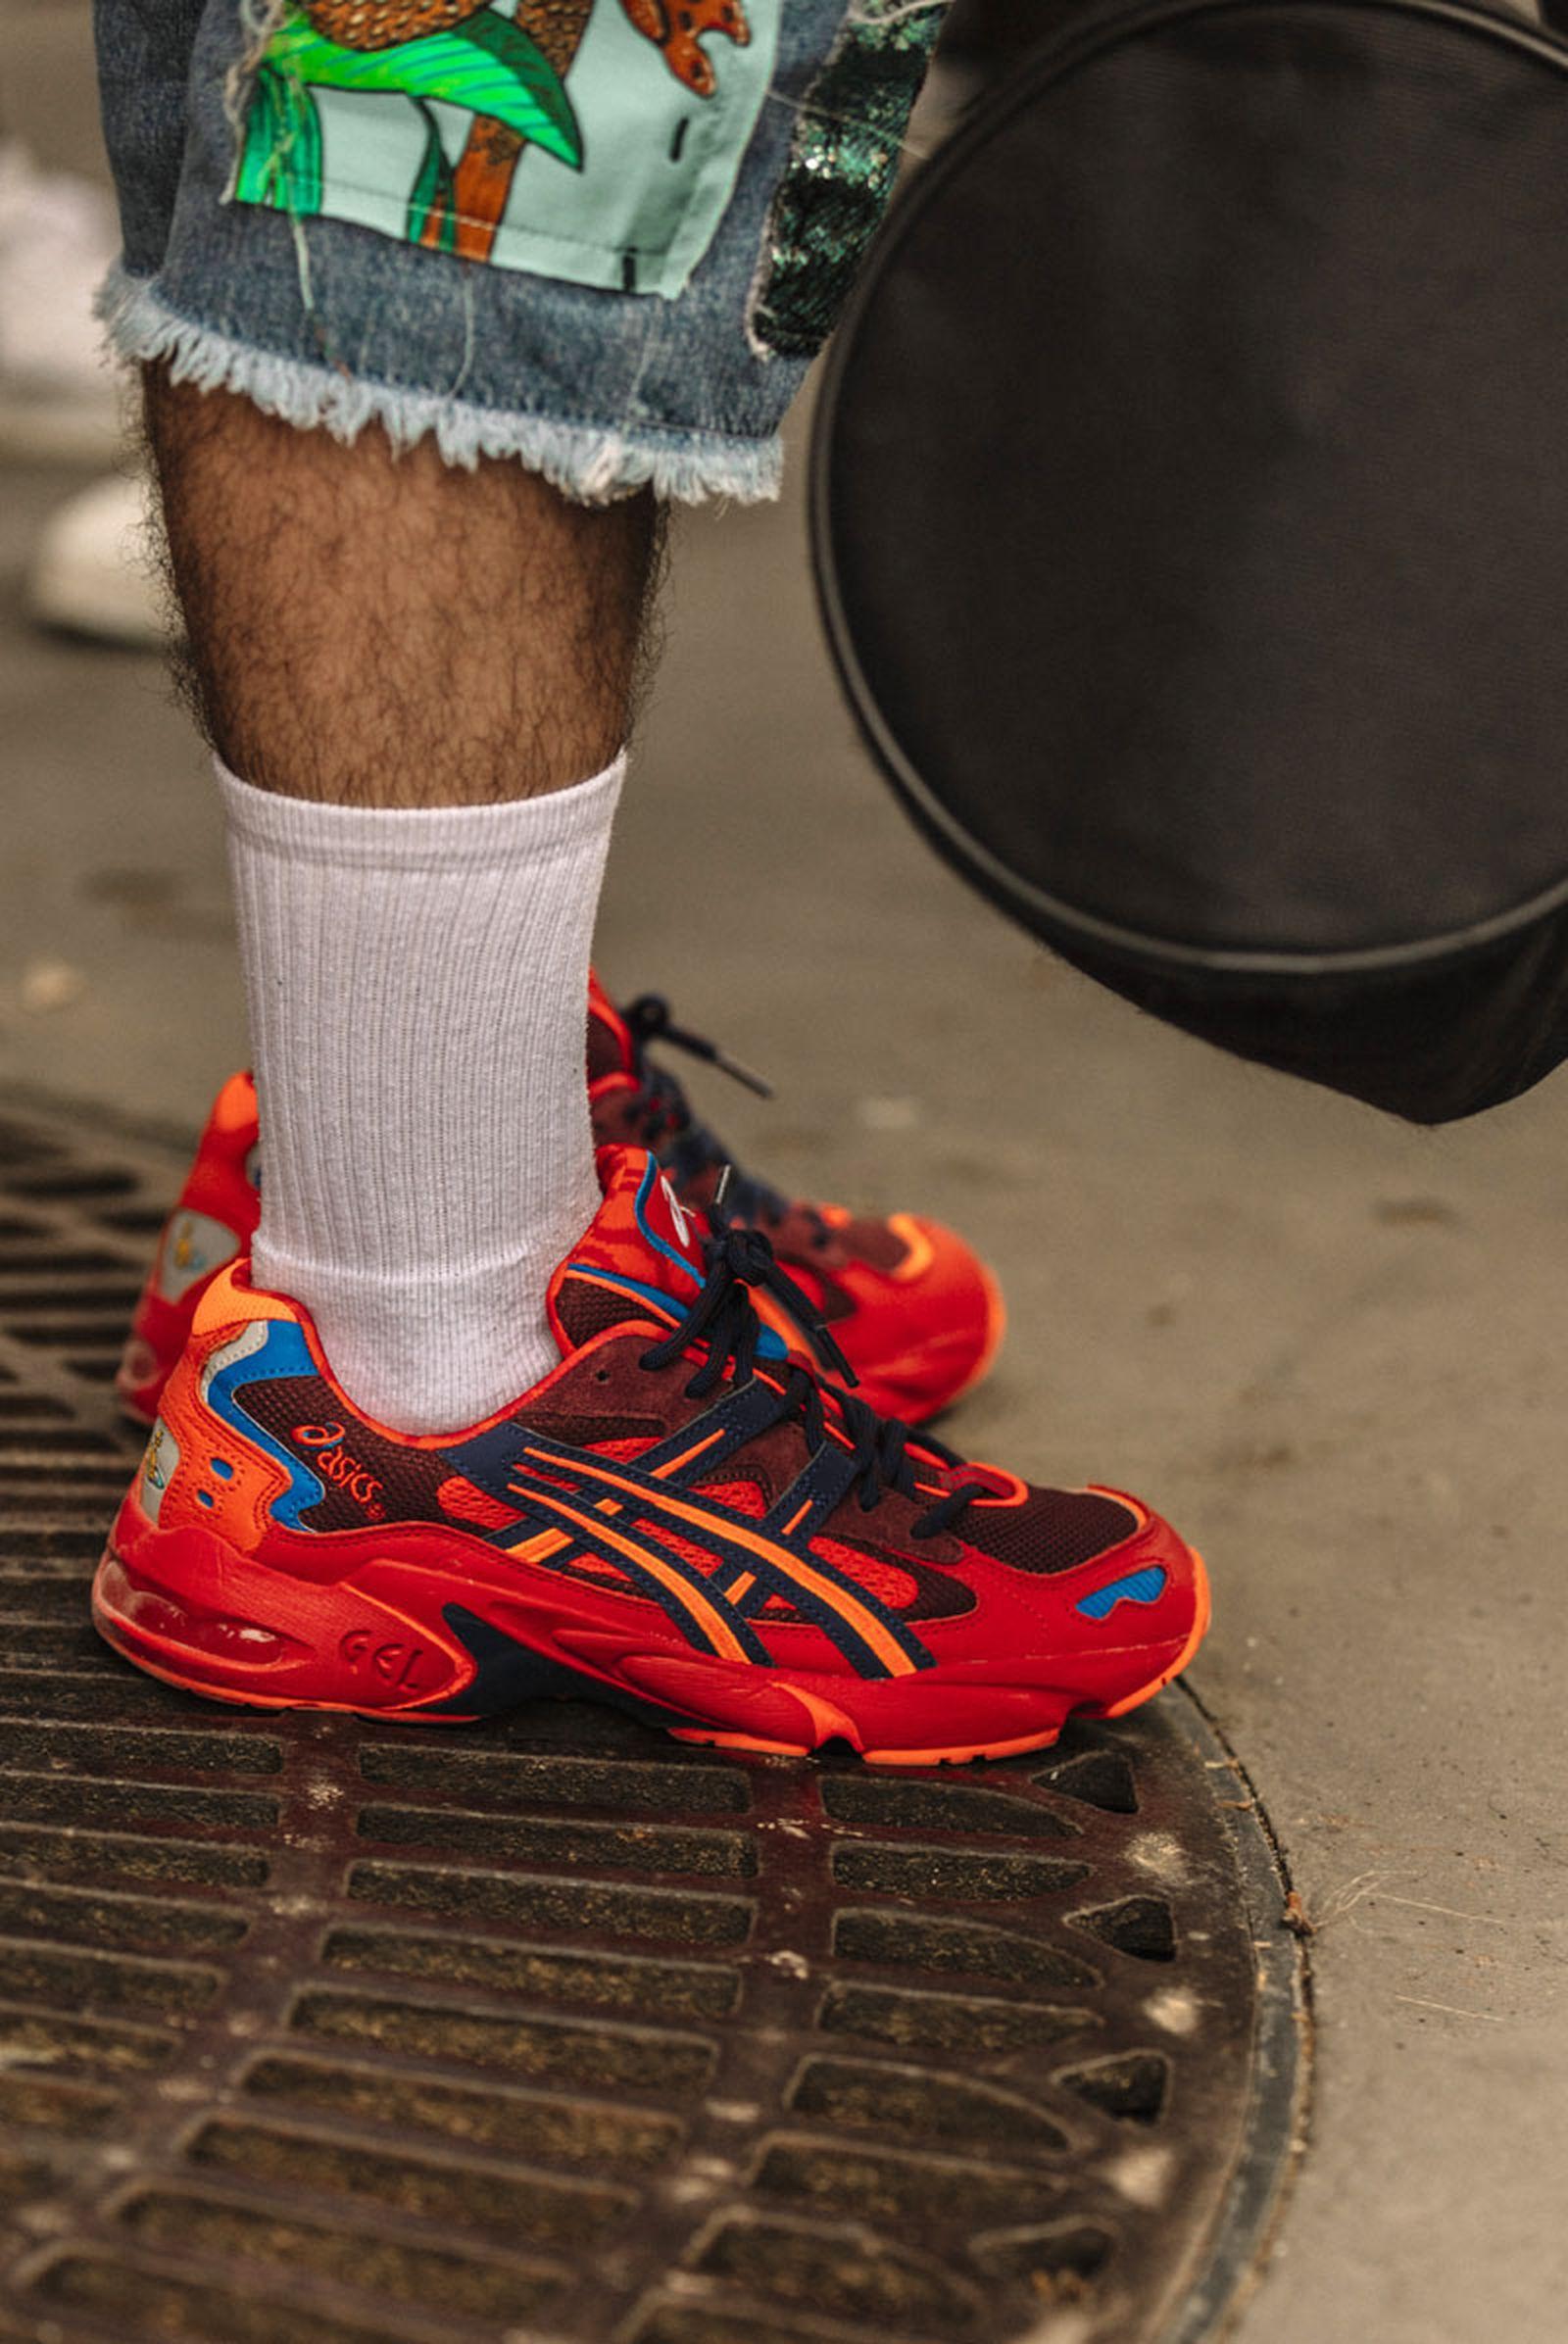 paris fashion week ss20 sneakers 017 Nike comme des garcons li ning